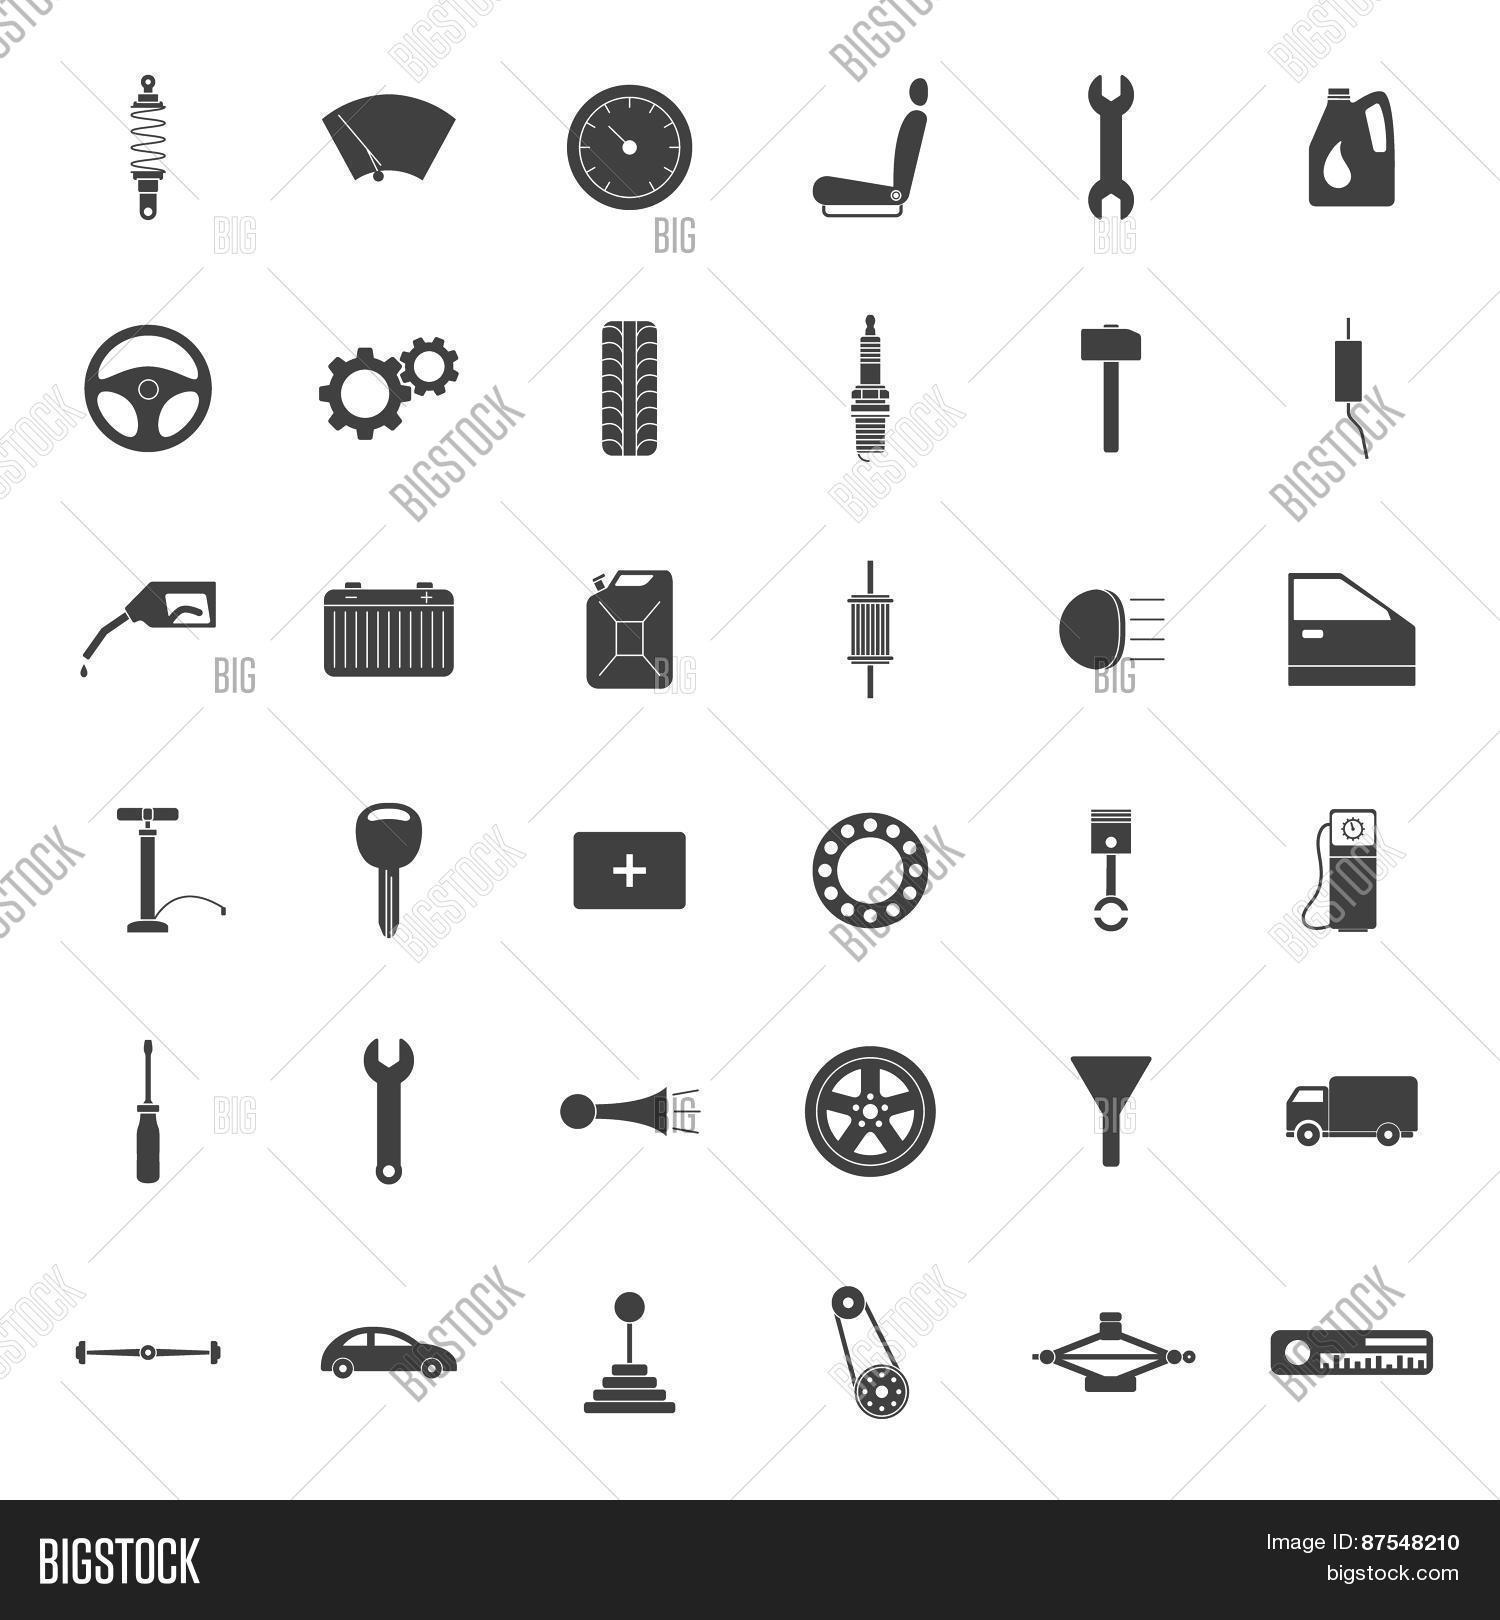 Simple Car Parts Icons Vector & Photo | Bigstock